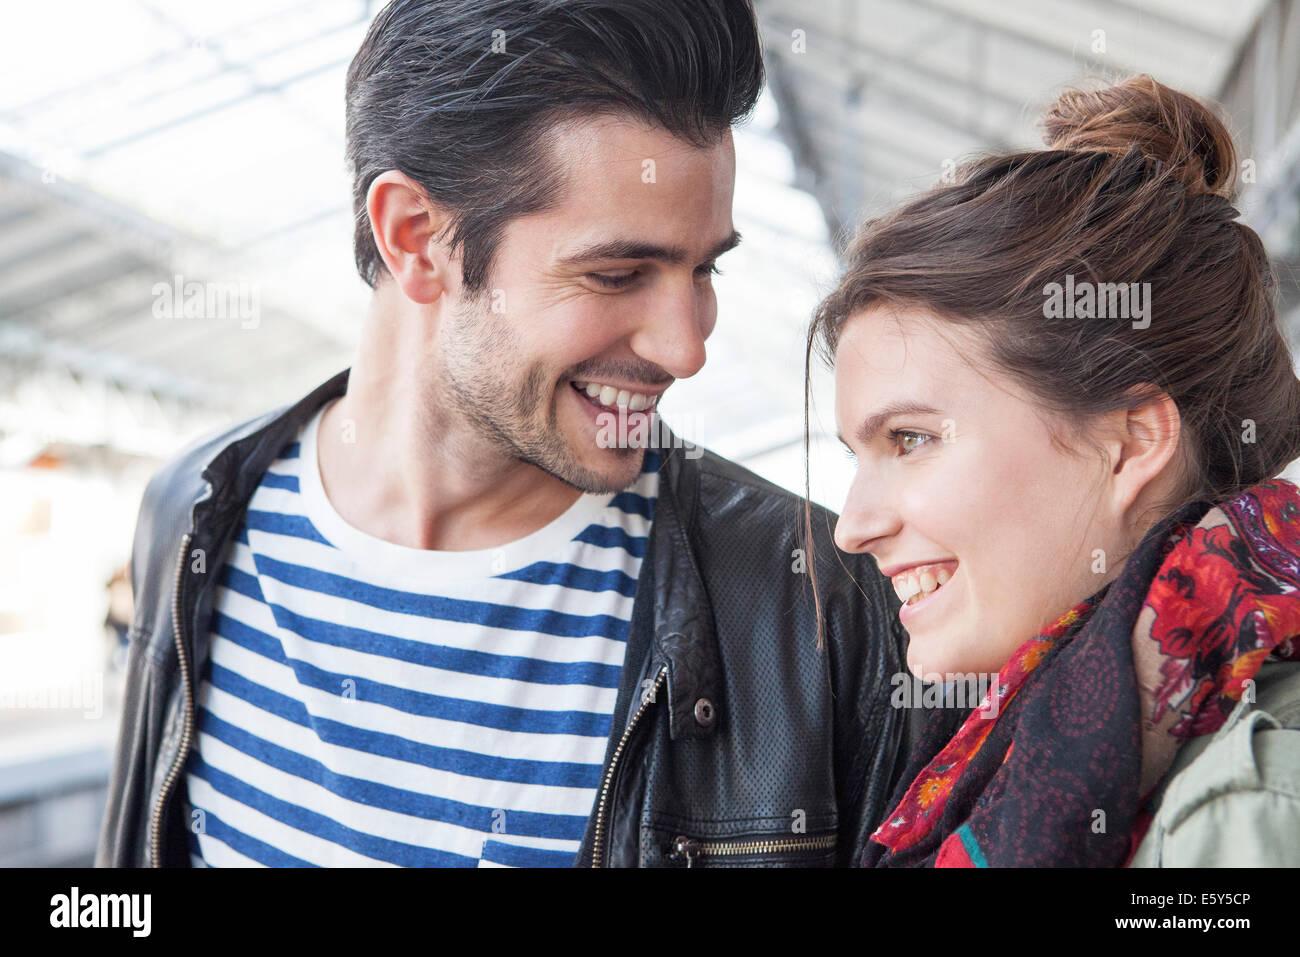 Jeune couple ensemble on train platform Photo Stock